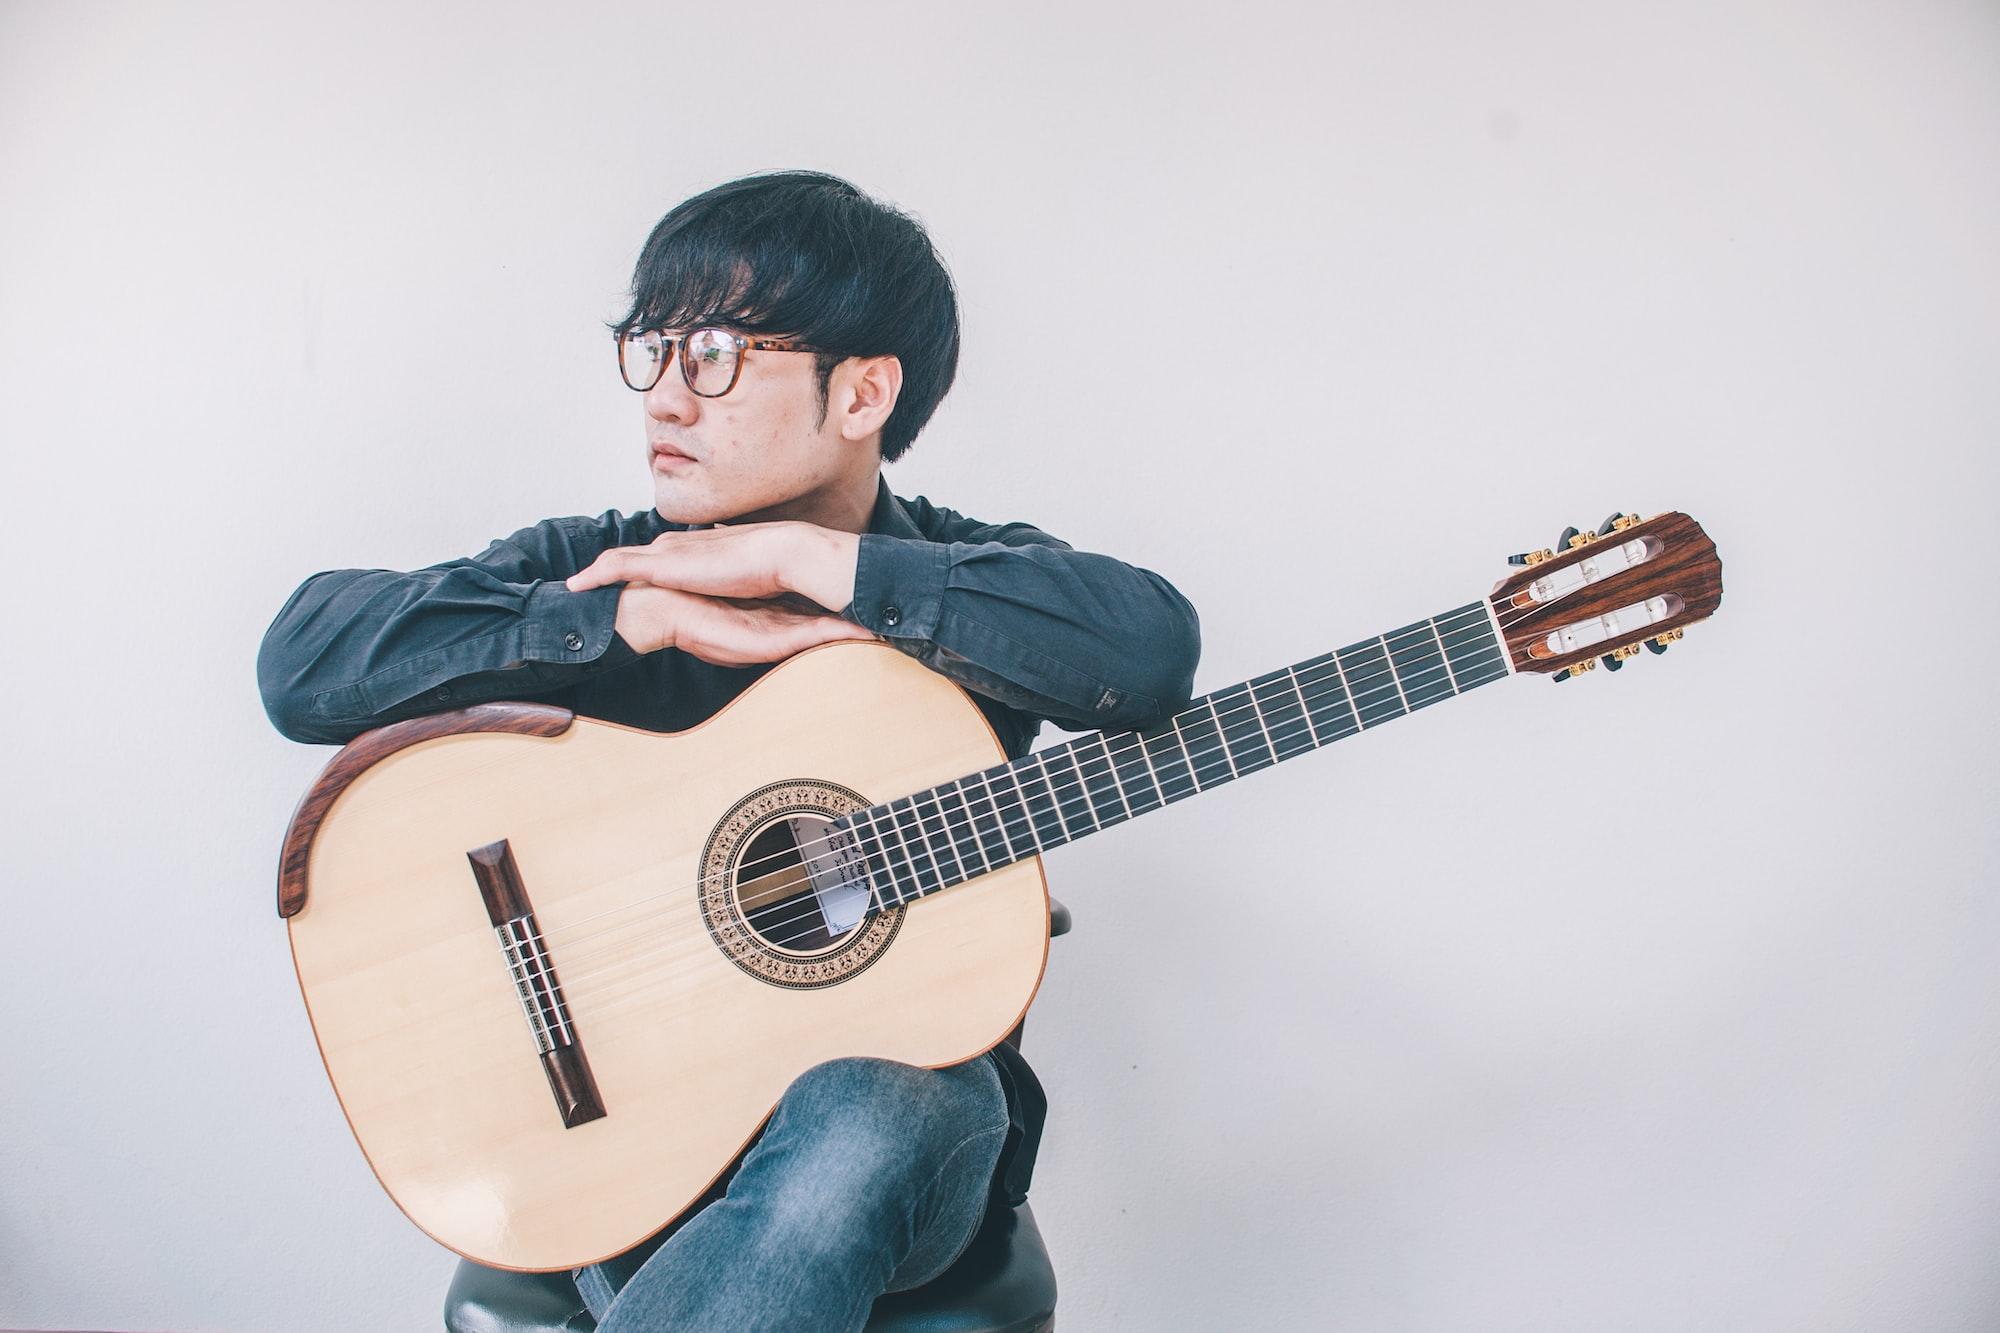 'Professional musician' vs. 'artist'